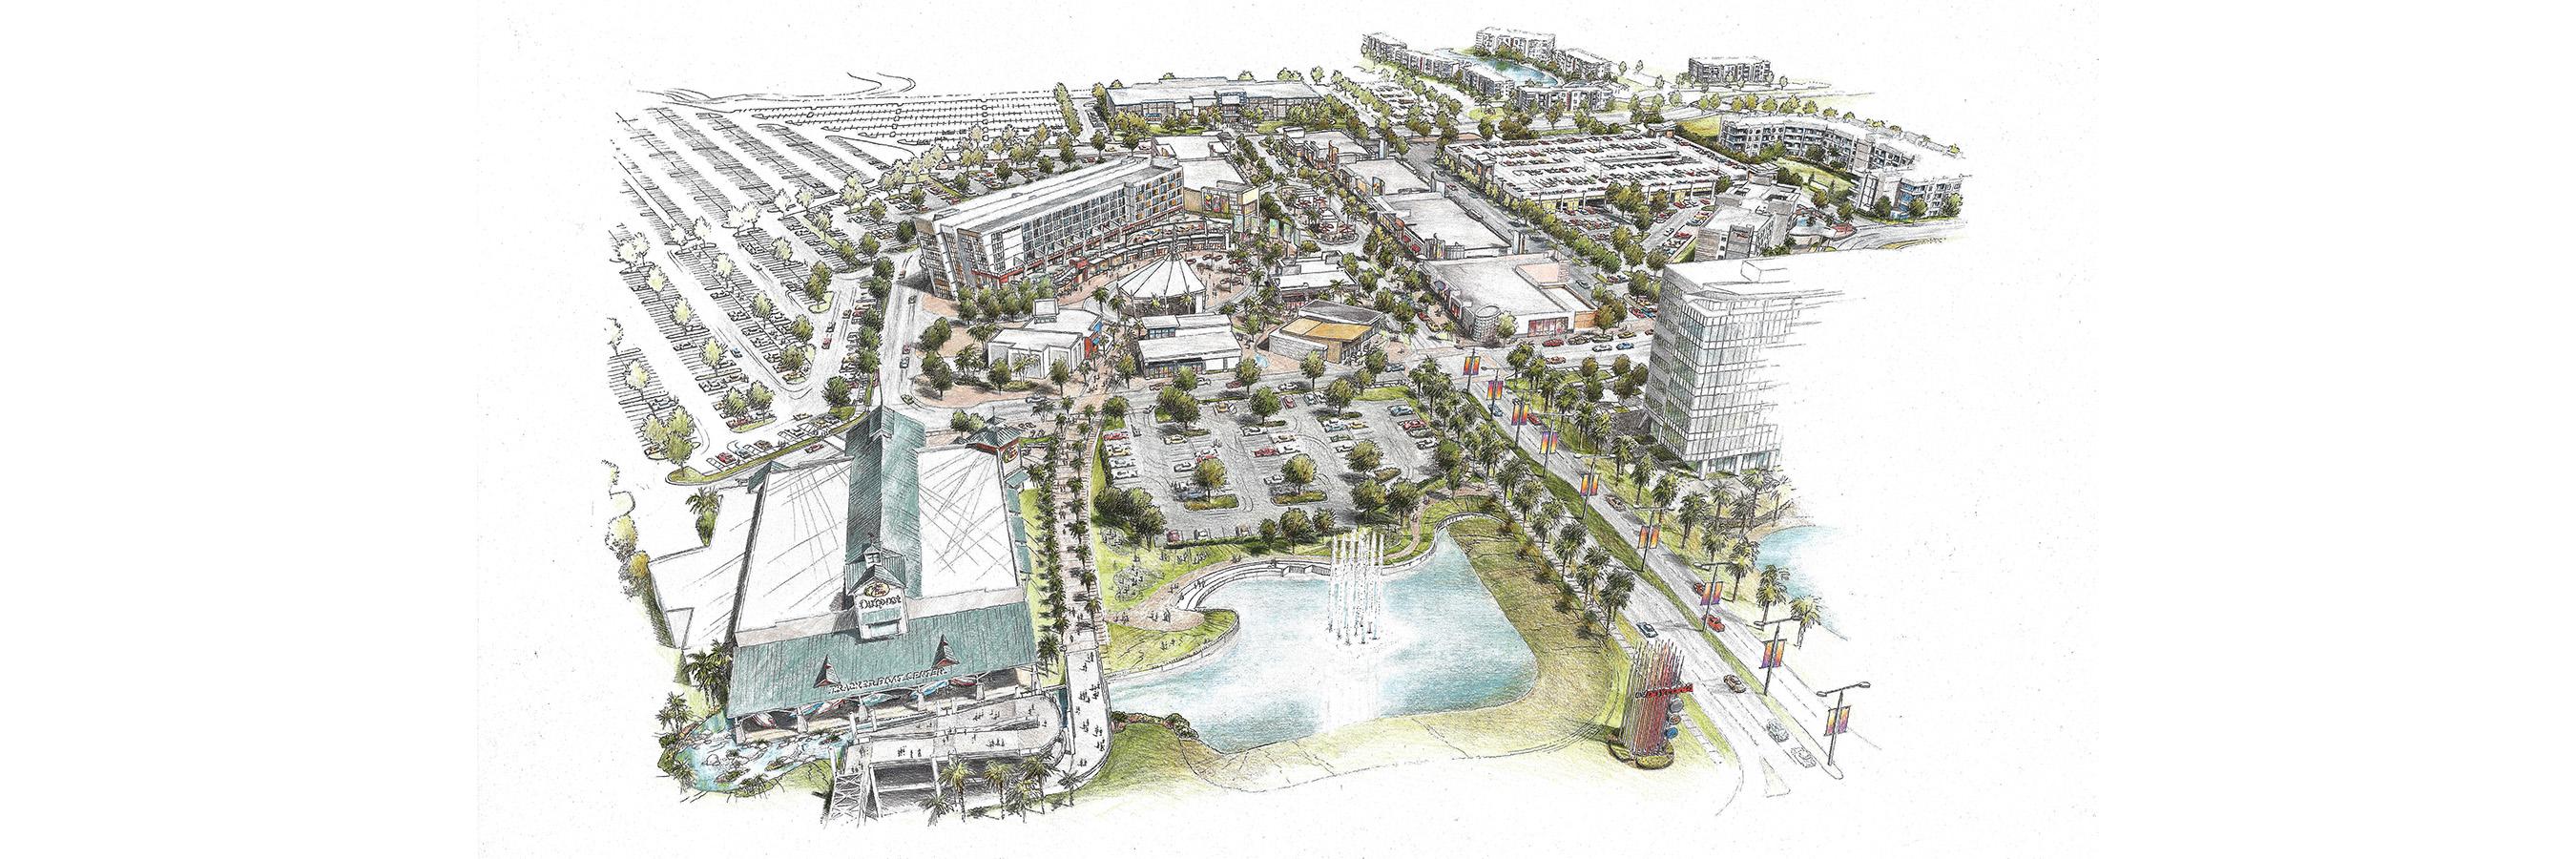 ONE DAYTONA, Daytona Beach's premier retail, dining and entertainment destination